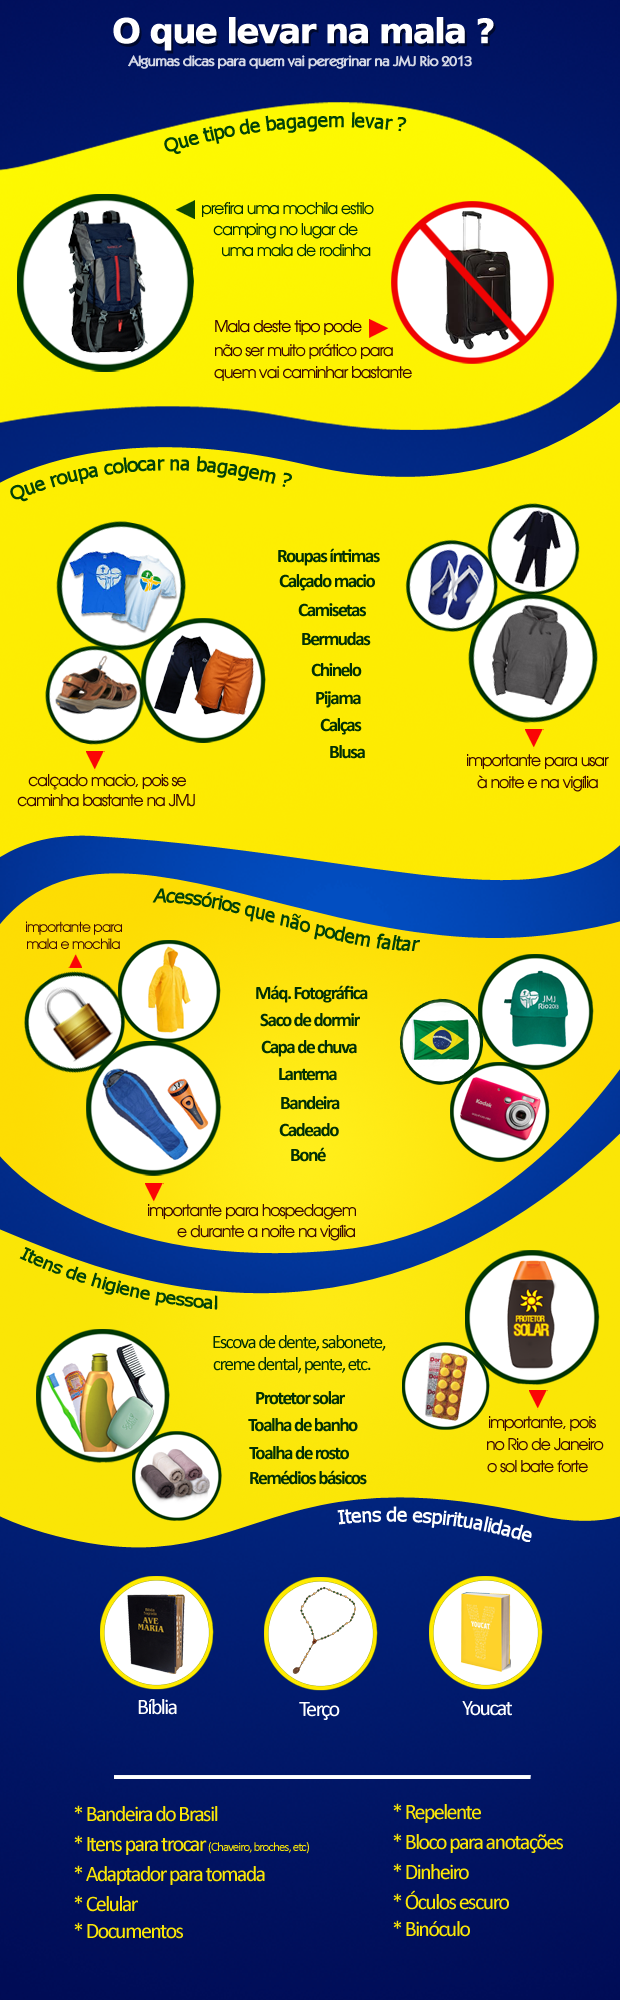 infografico-bagagem